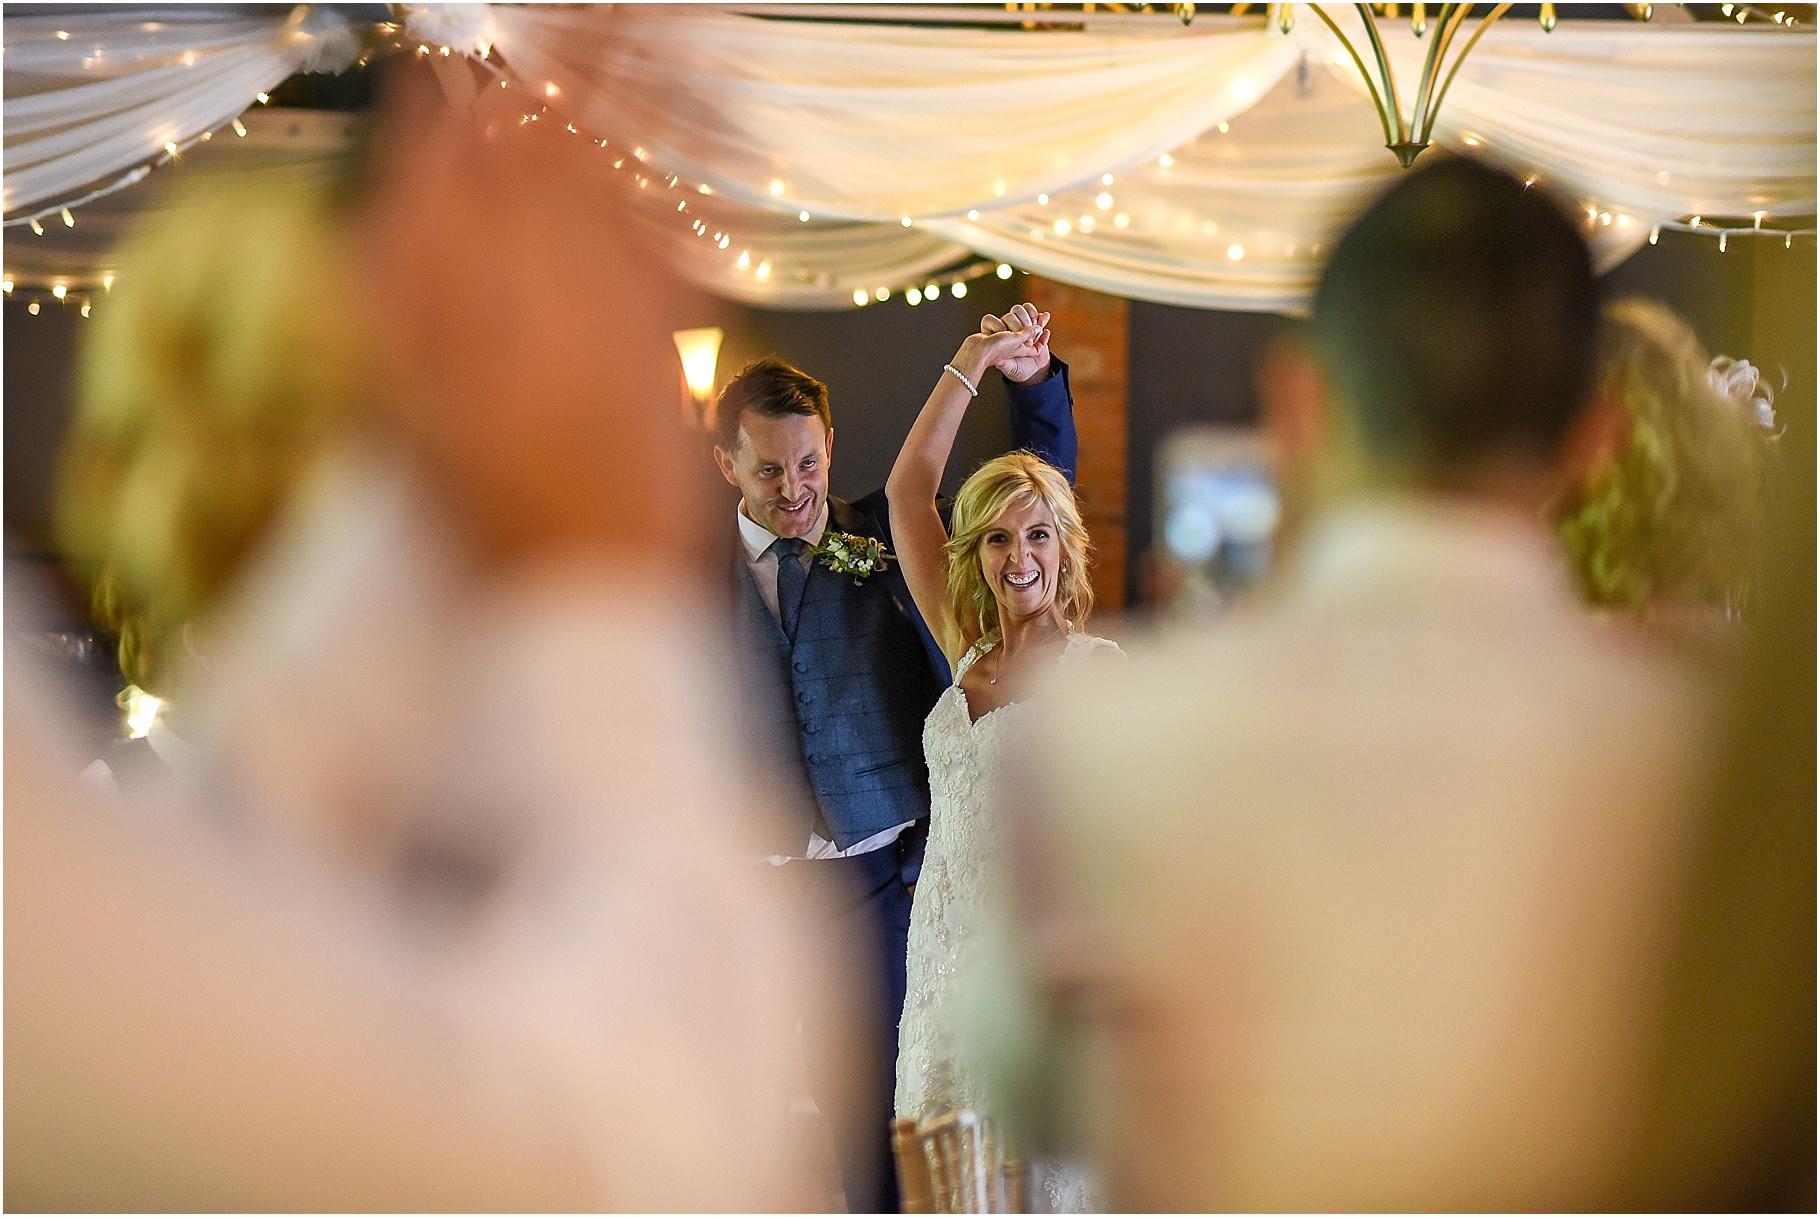 bartle-hall-wedding-photography-069.jpg